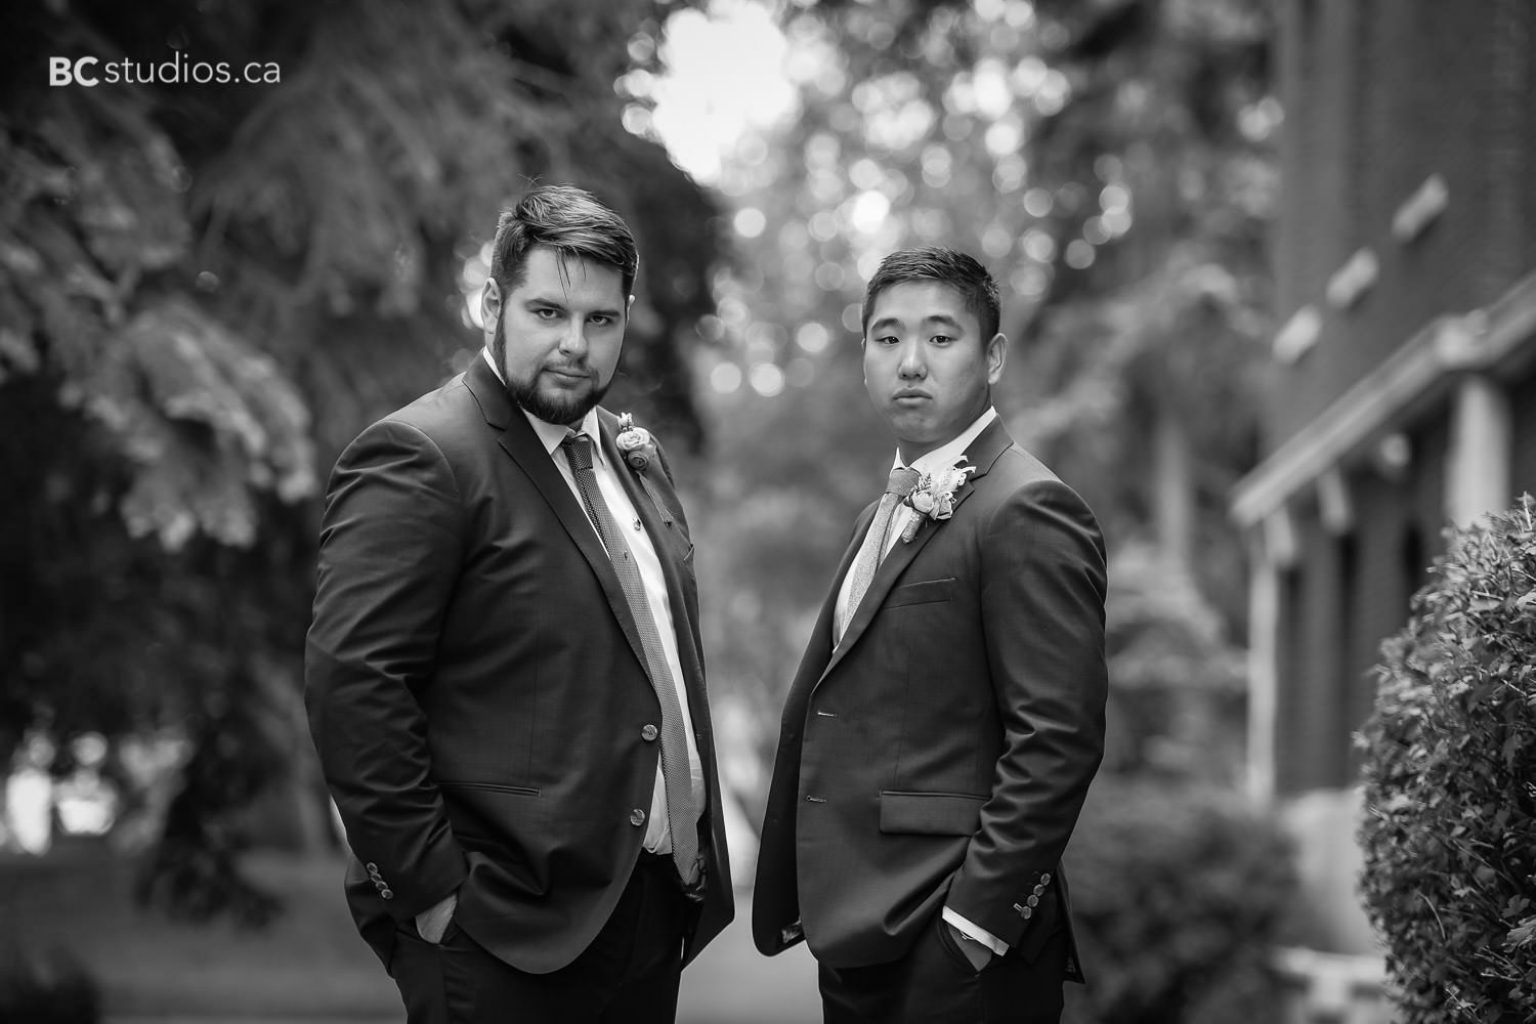 groom and groomsmen. wedding formals at university of alberta.